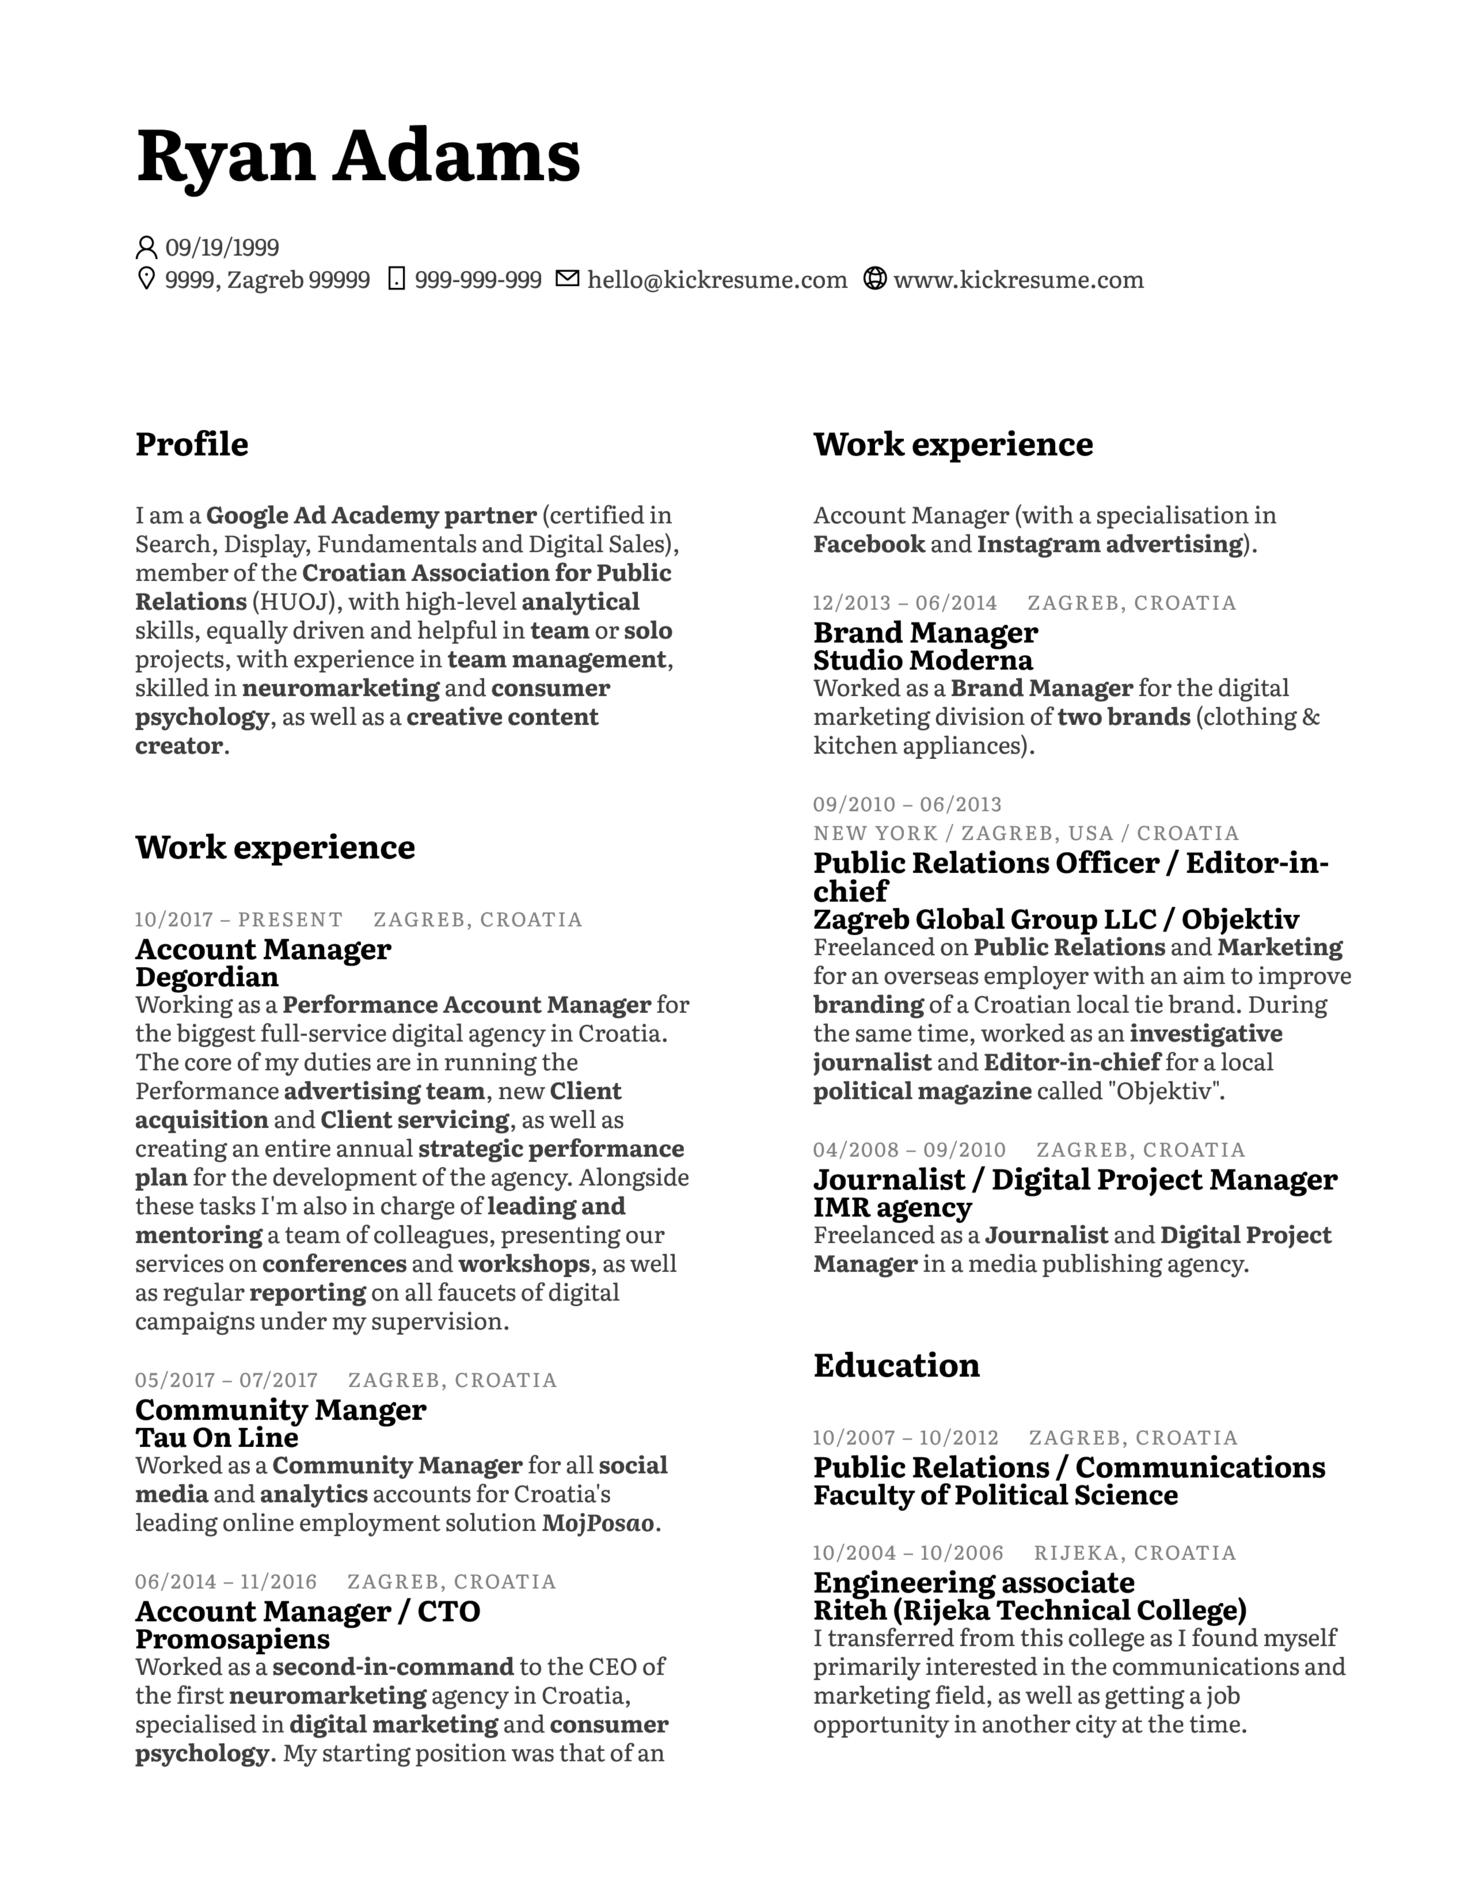 Senior Marketing Analyst CV Example (Parte 1)